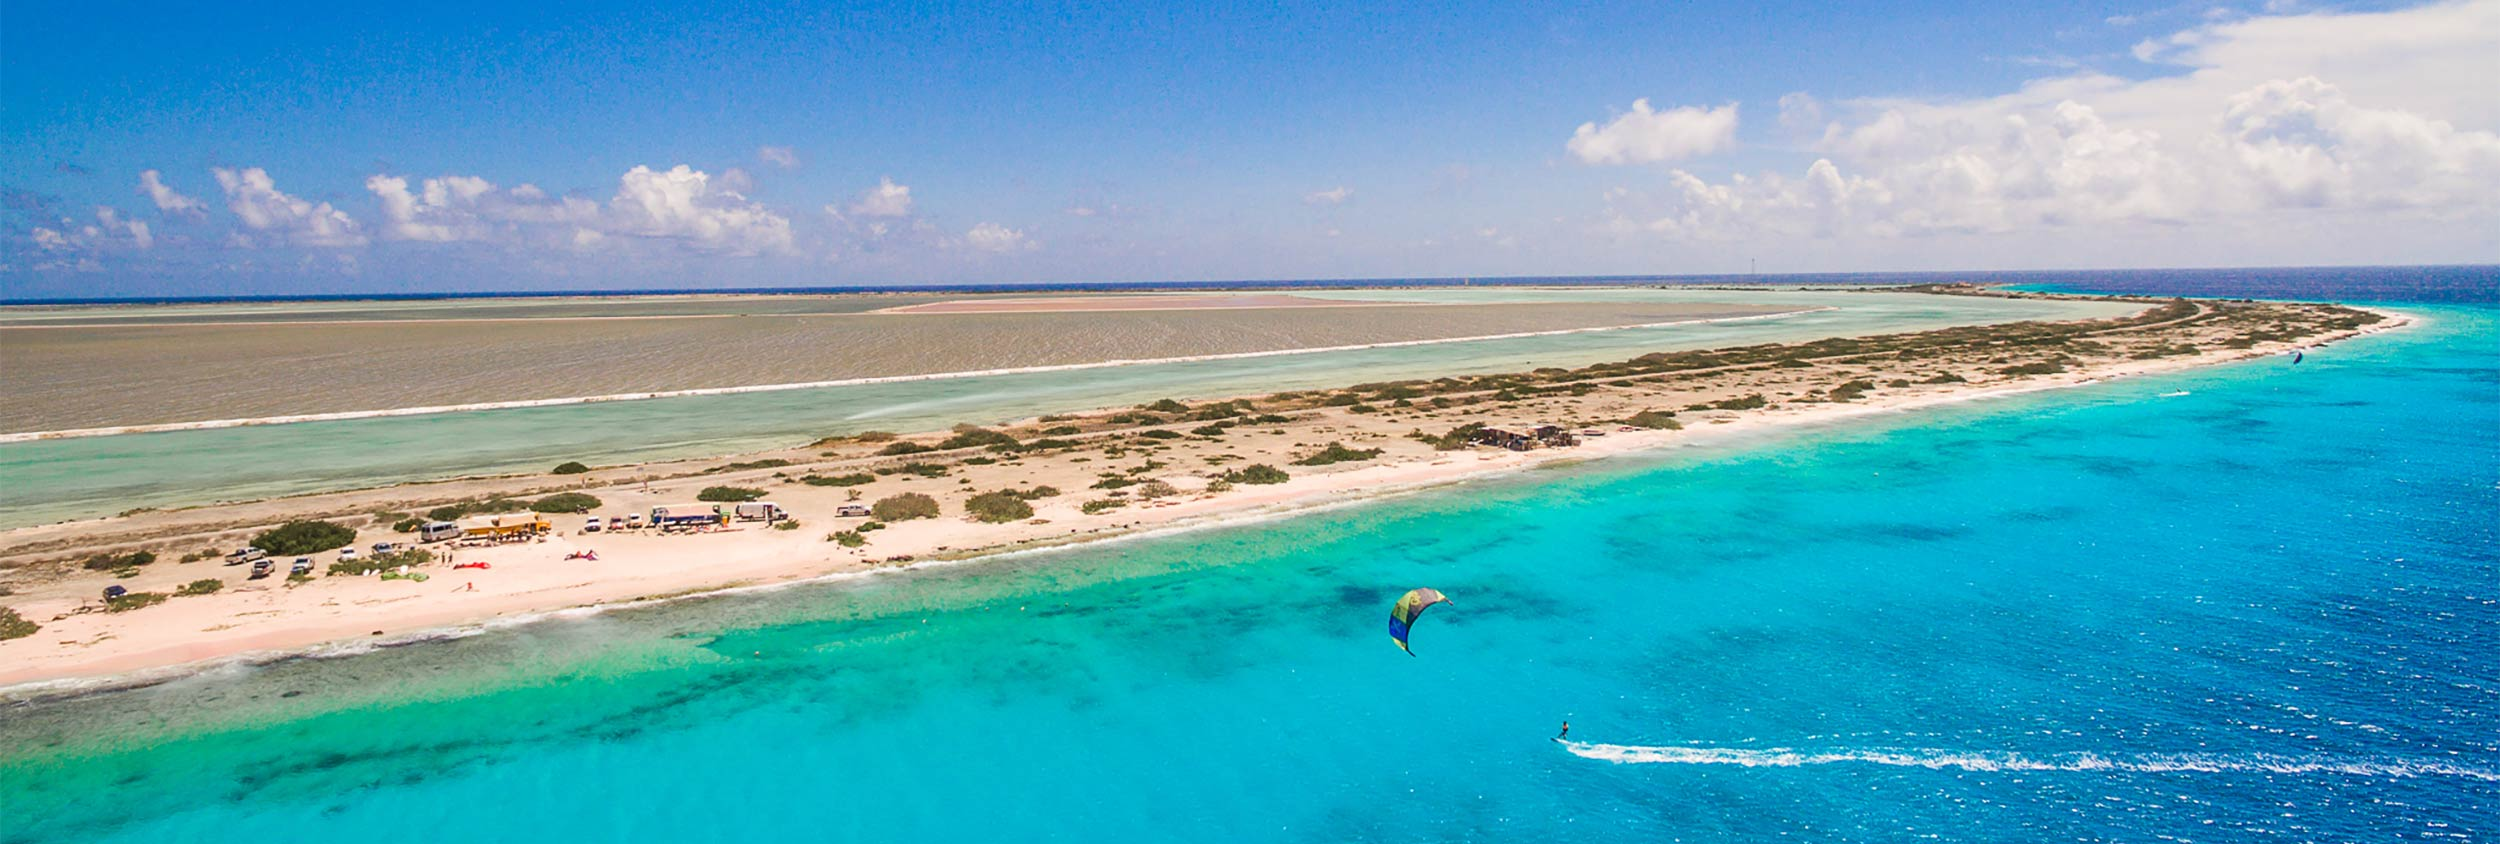 Bonaire - Caribbean